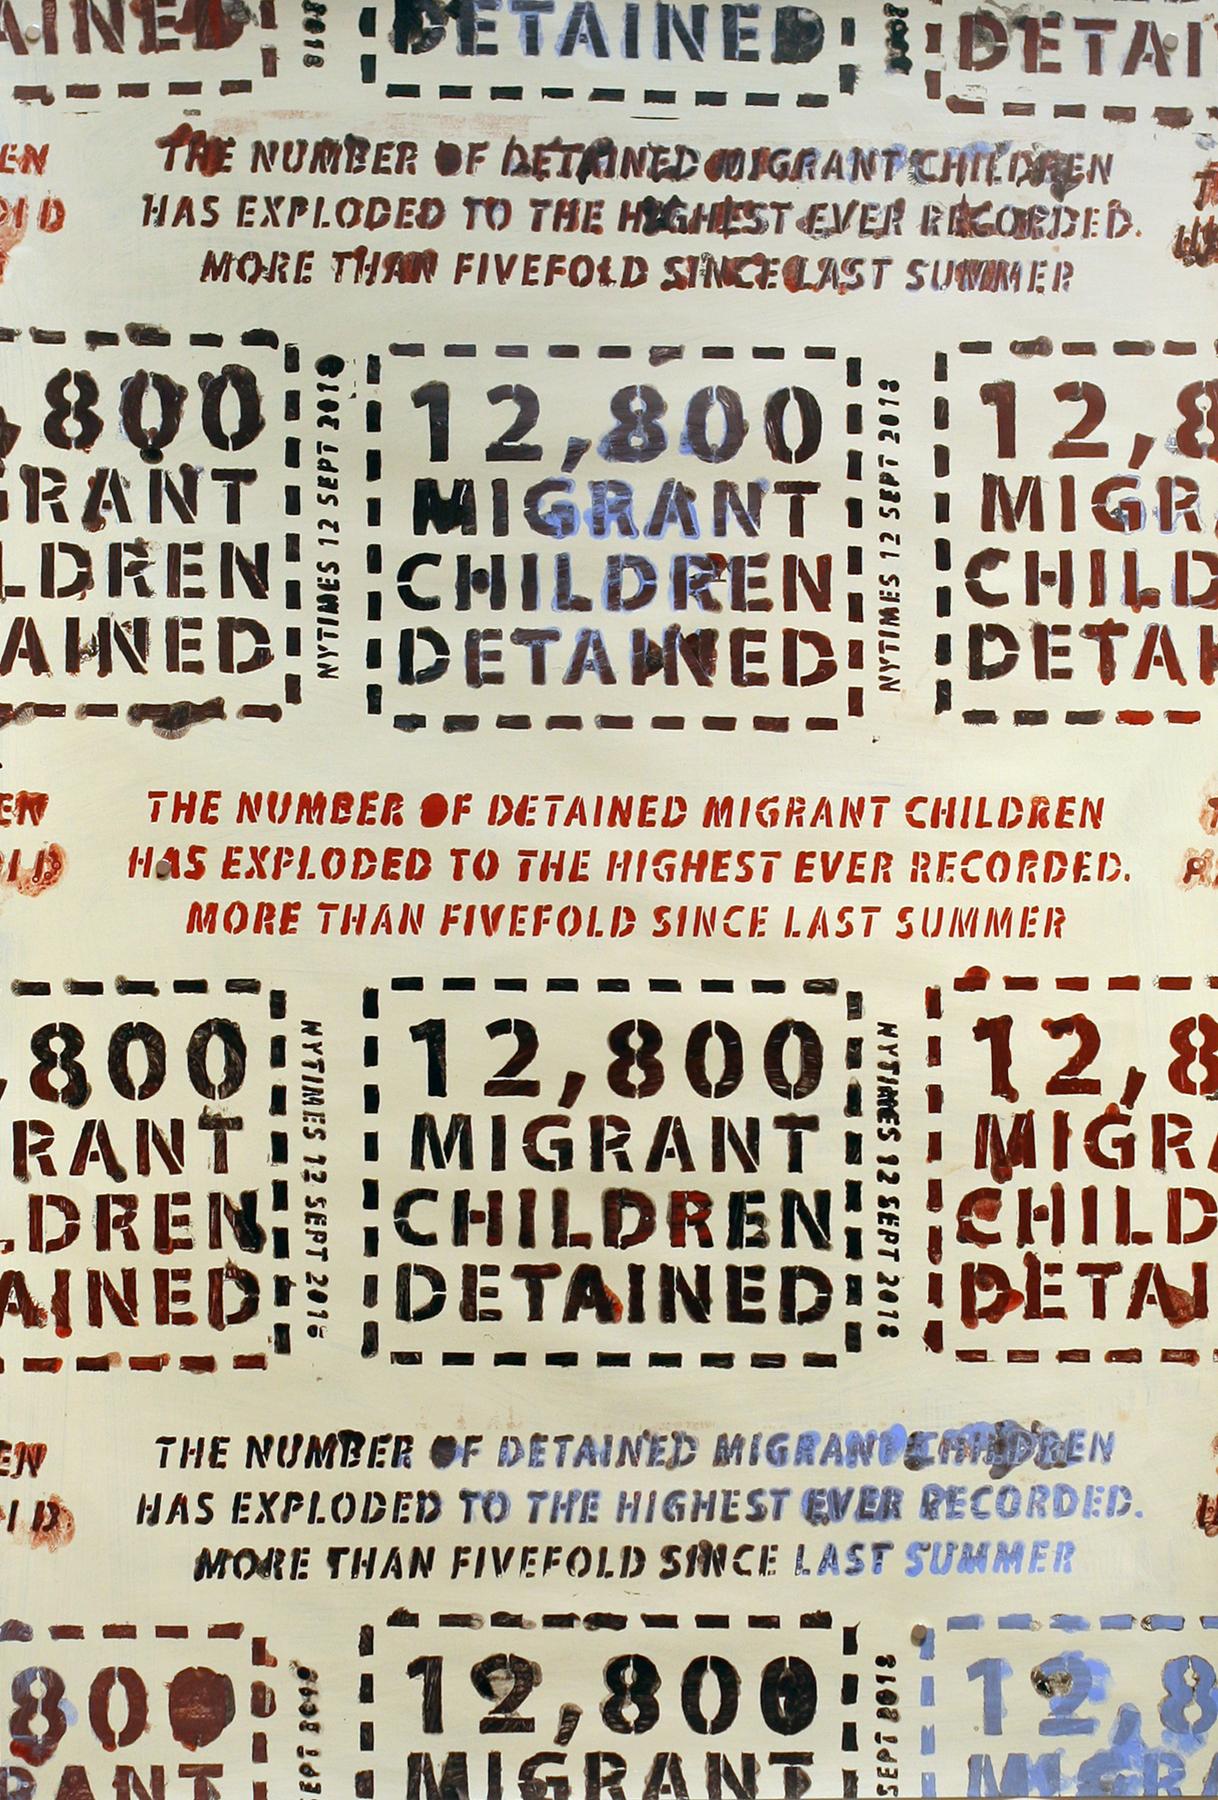 12,800 Migrant Children Detained